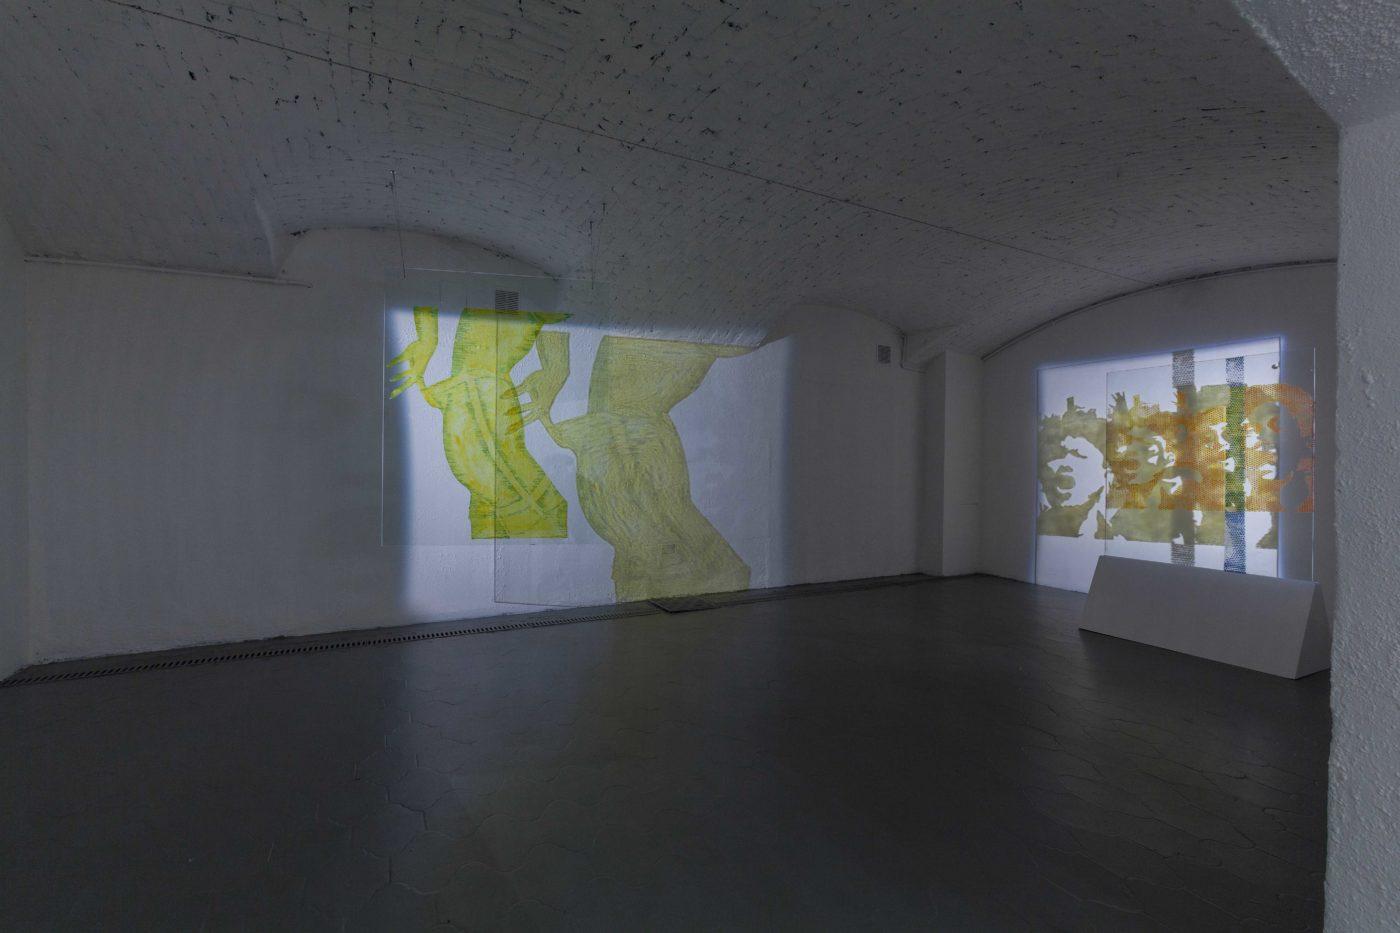 Umberto Bignardi - Sperimentazioni visuali a Roma (1964-1967). Galleria Bianconi, Milano